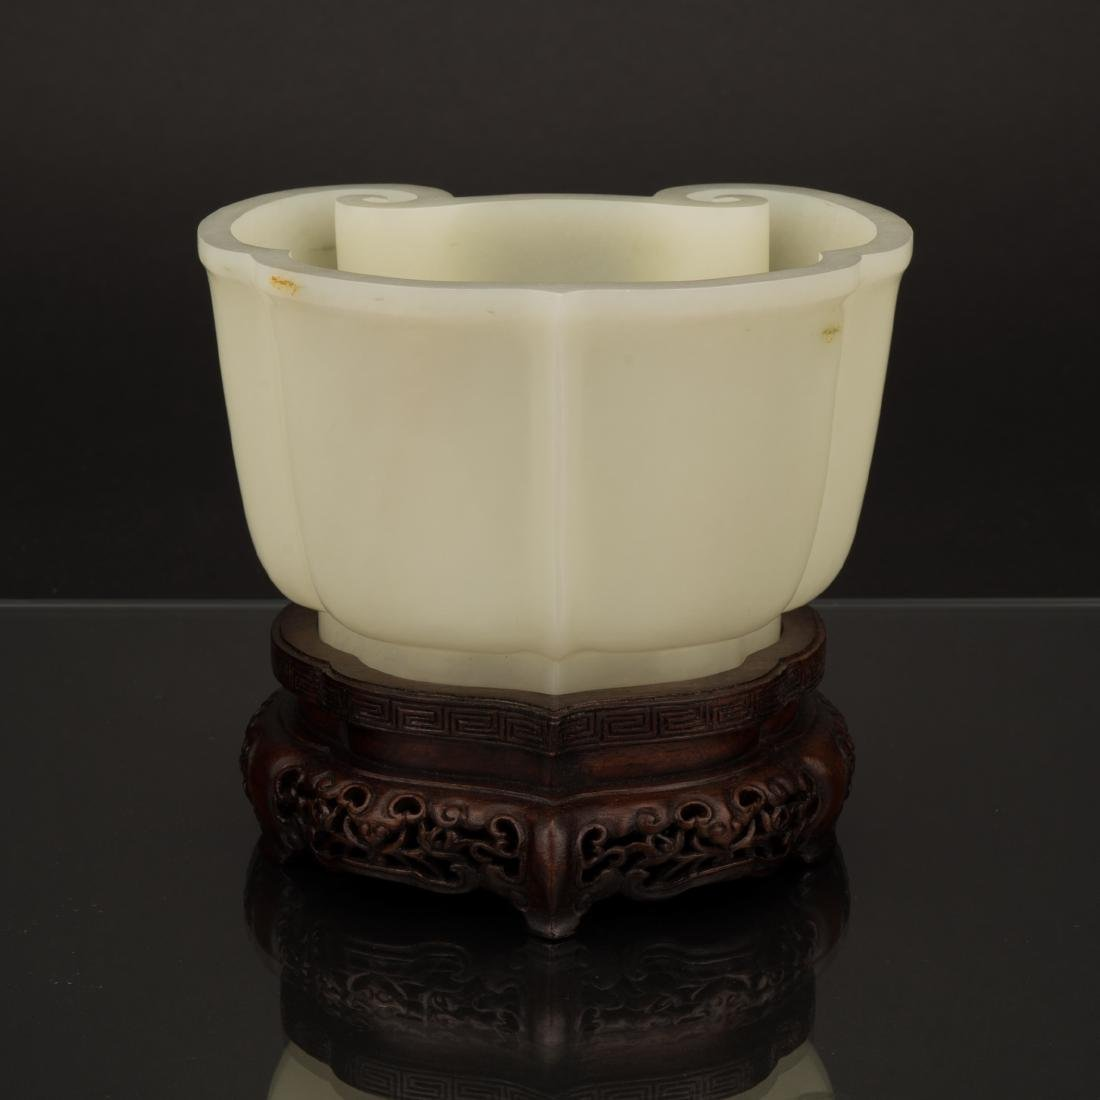 QING RUYI-SHAPED WHITE JADE CUP